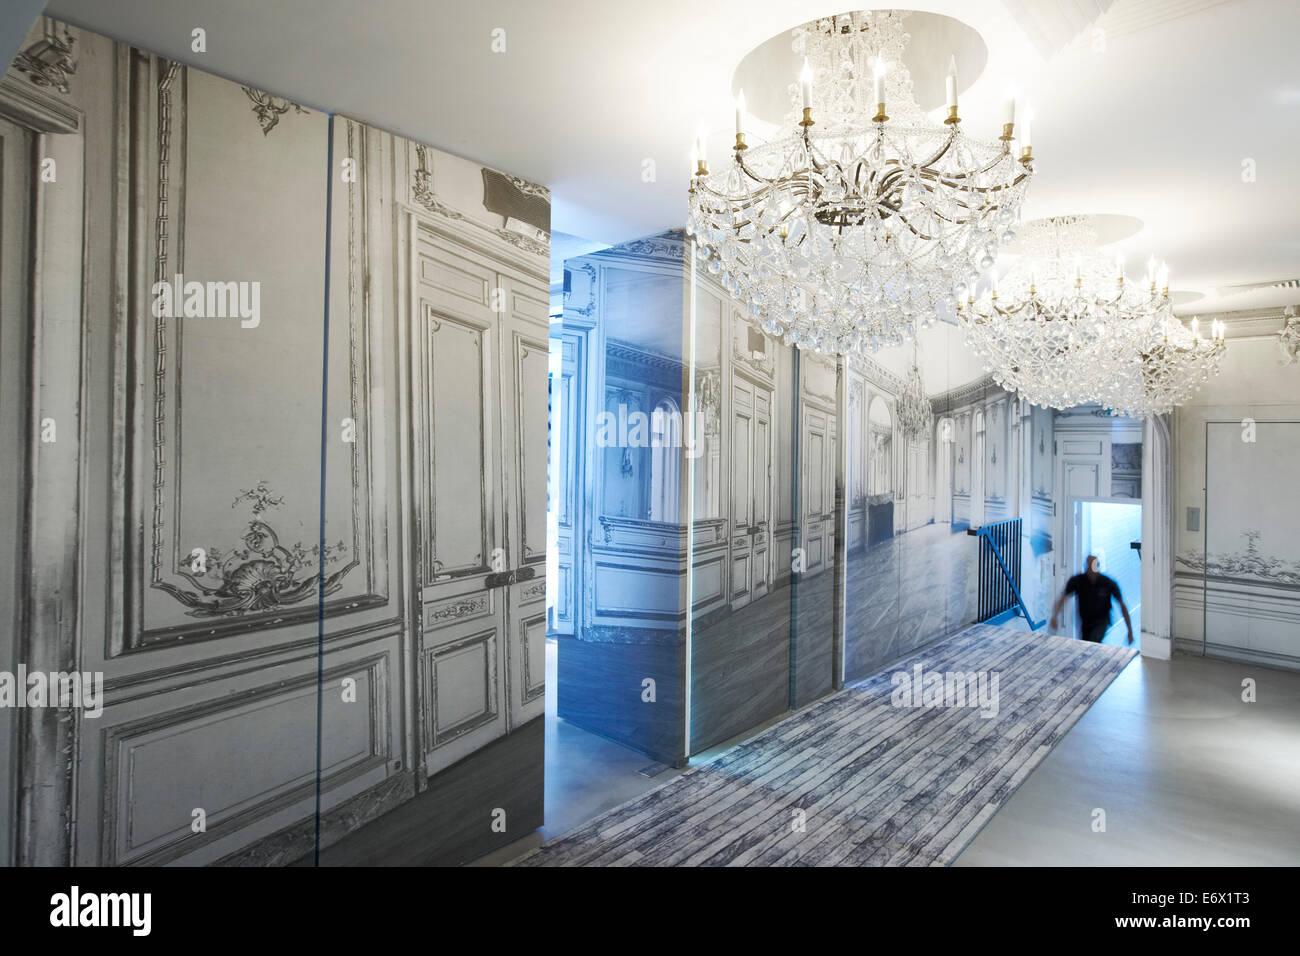 Kronleuchter Für Den Flur ~ Flur mit kronleuchter im hotel la maison champs elysees entworfen